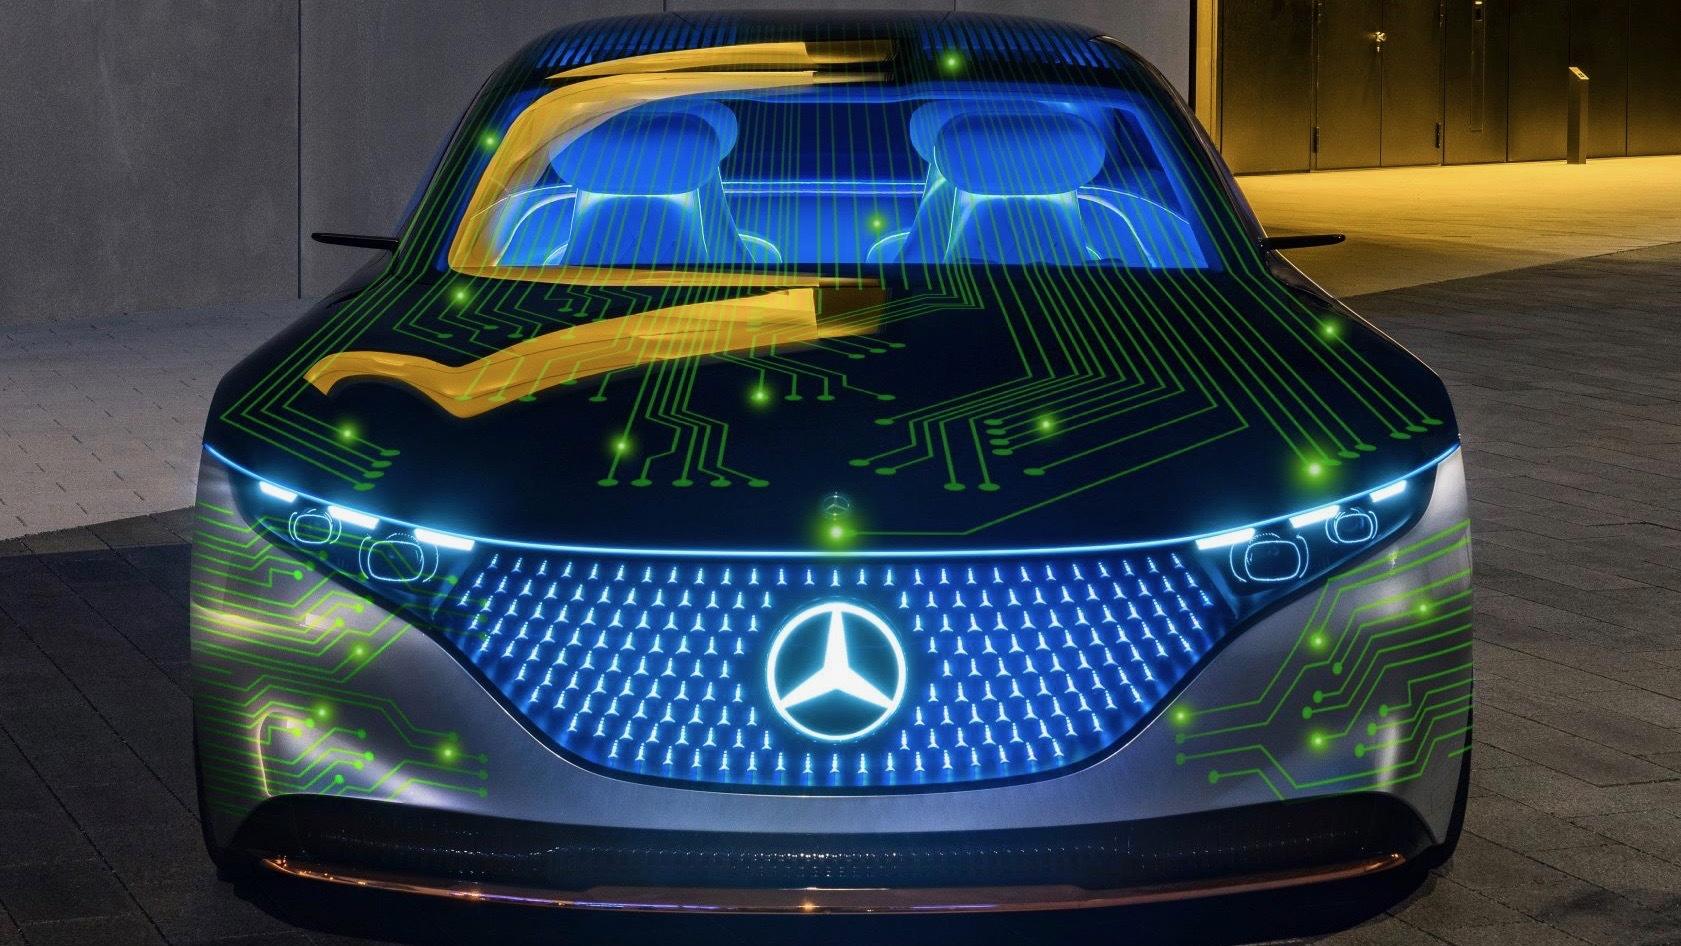 Mercedes-Benz and Nvidia technology partnership